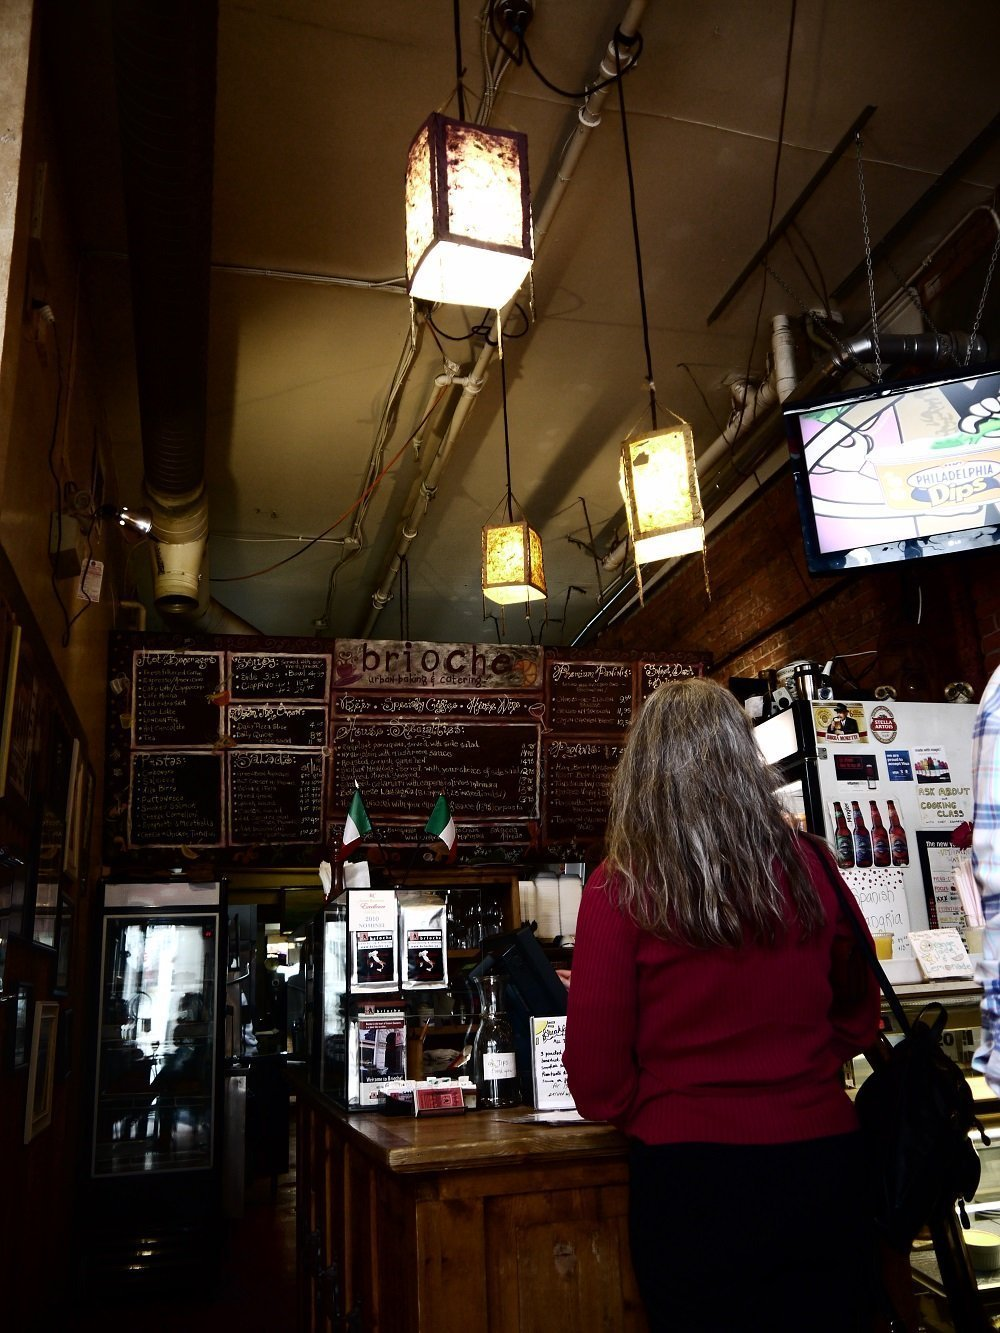 Café Brioche in Vancouver